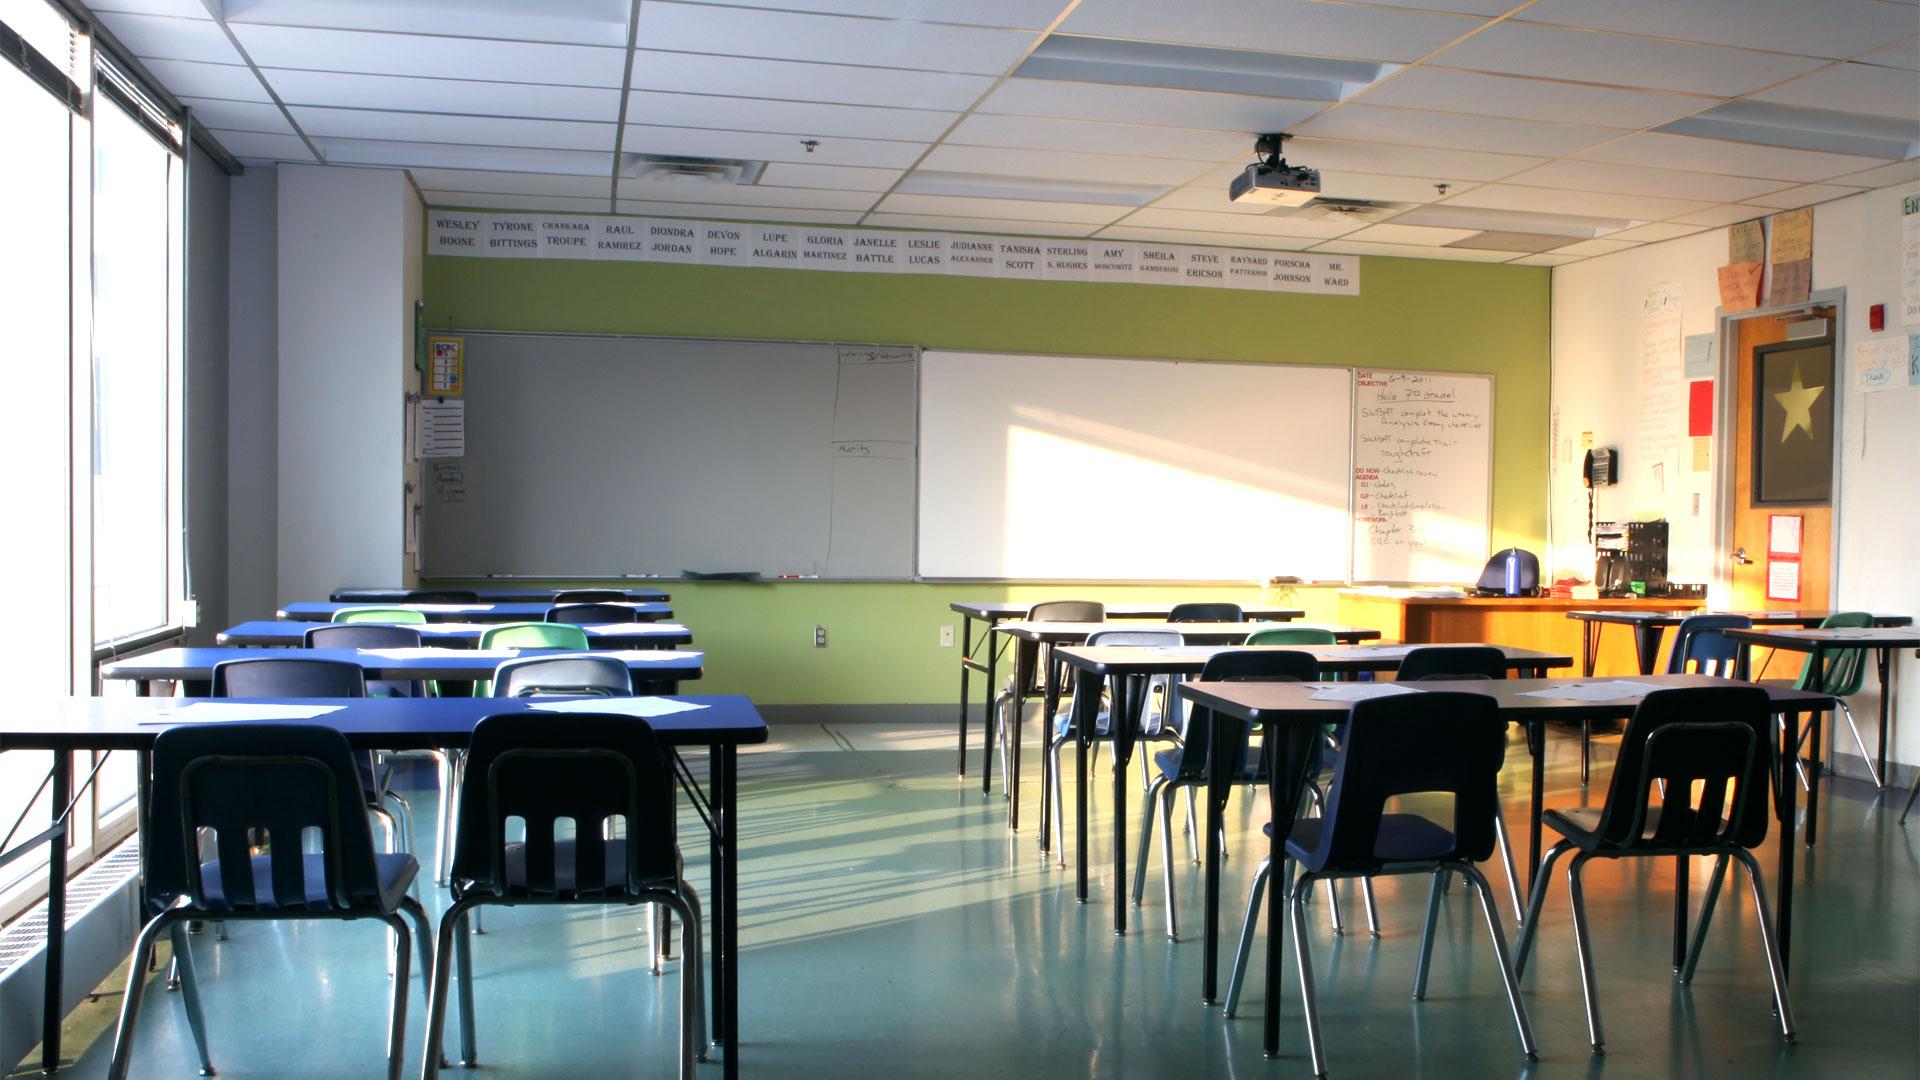 Free download School Classroom Background Mastery charter schools ...